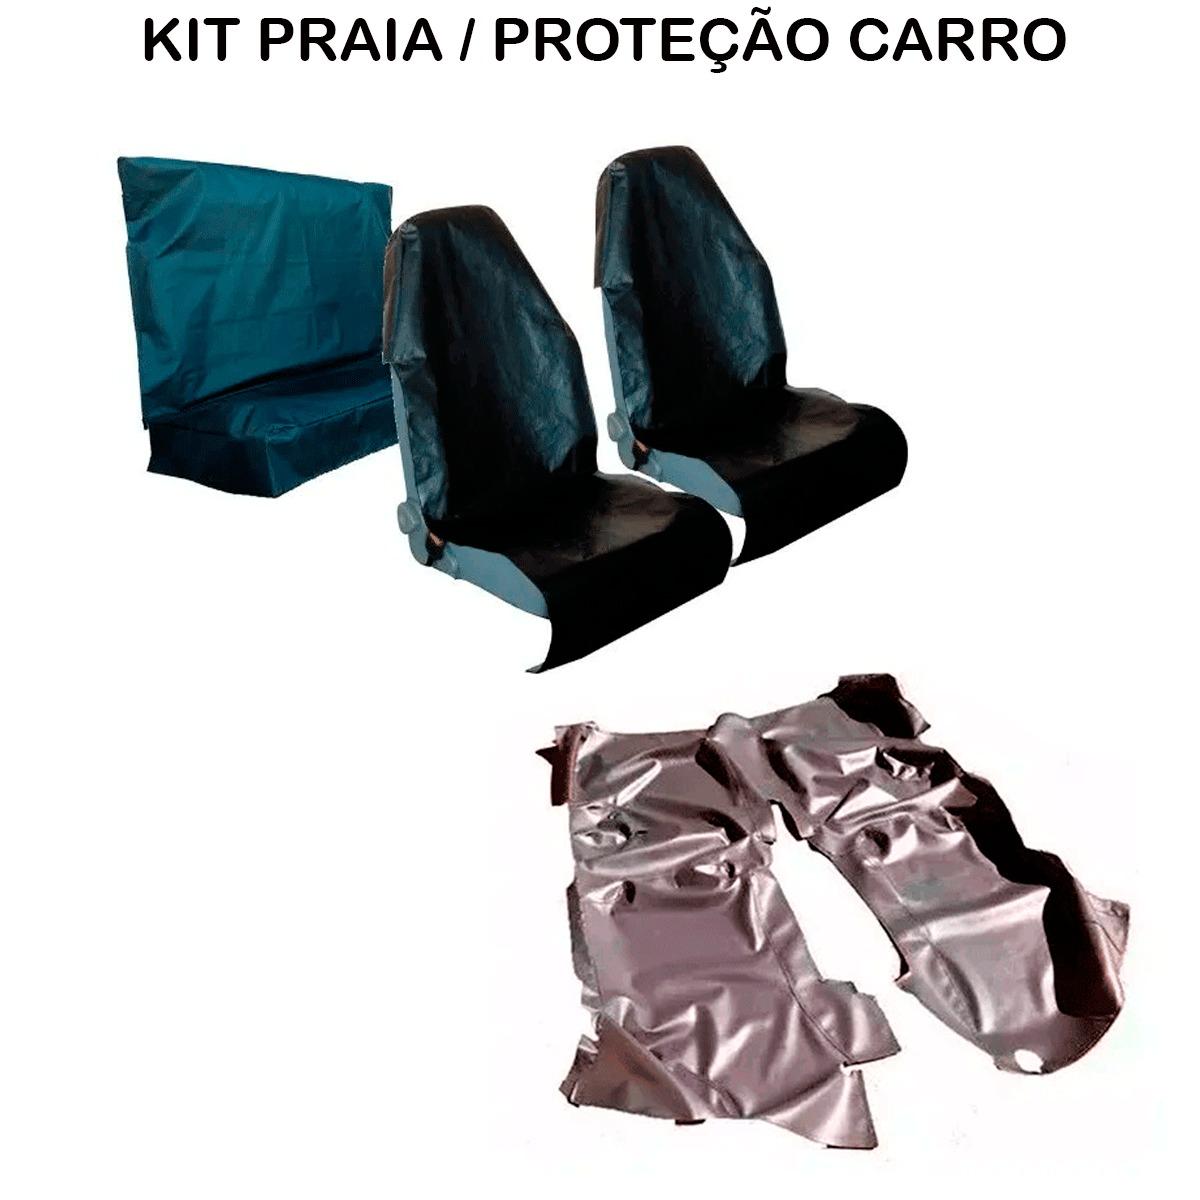 Tapete Em Vinil Volkswagen Golf 99 a 2007 + Capa Banco Protecao Banco Areia Suor Academia